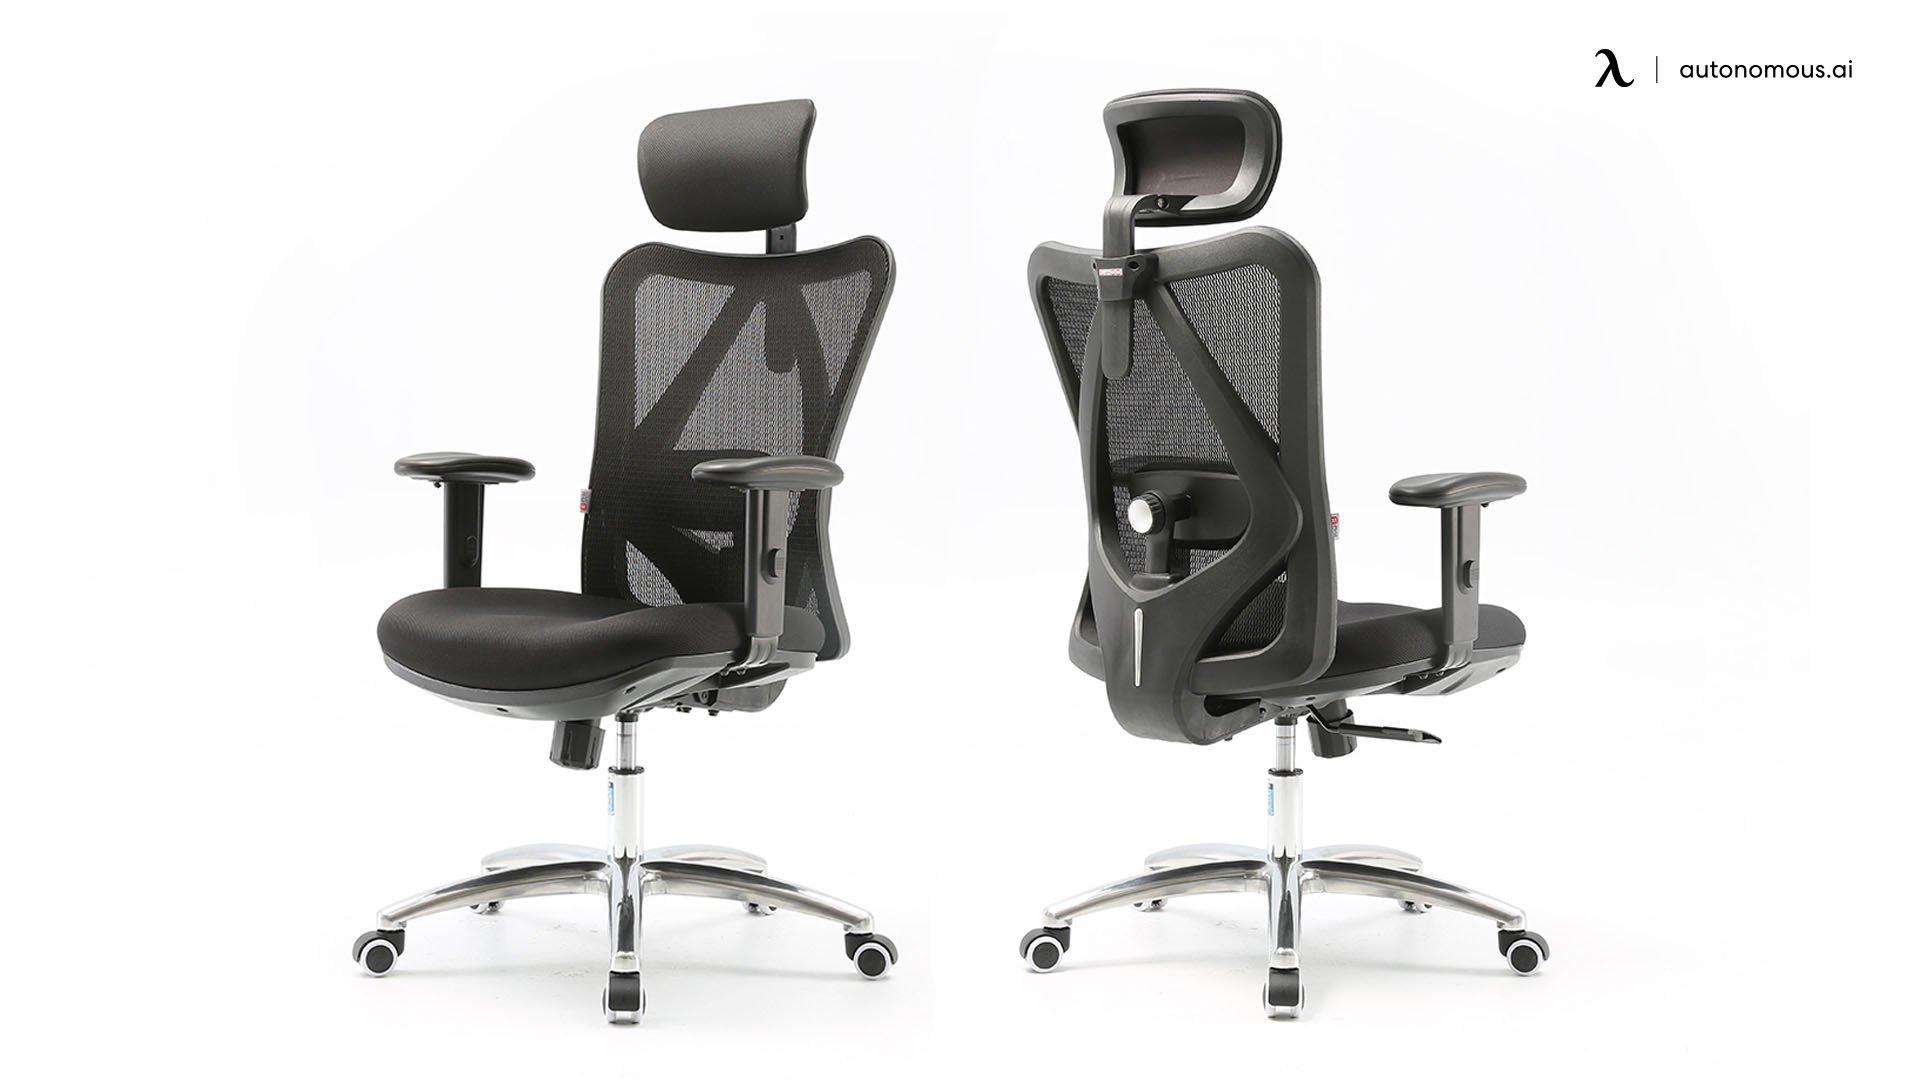 Sihoo M57 High Back Office Chair